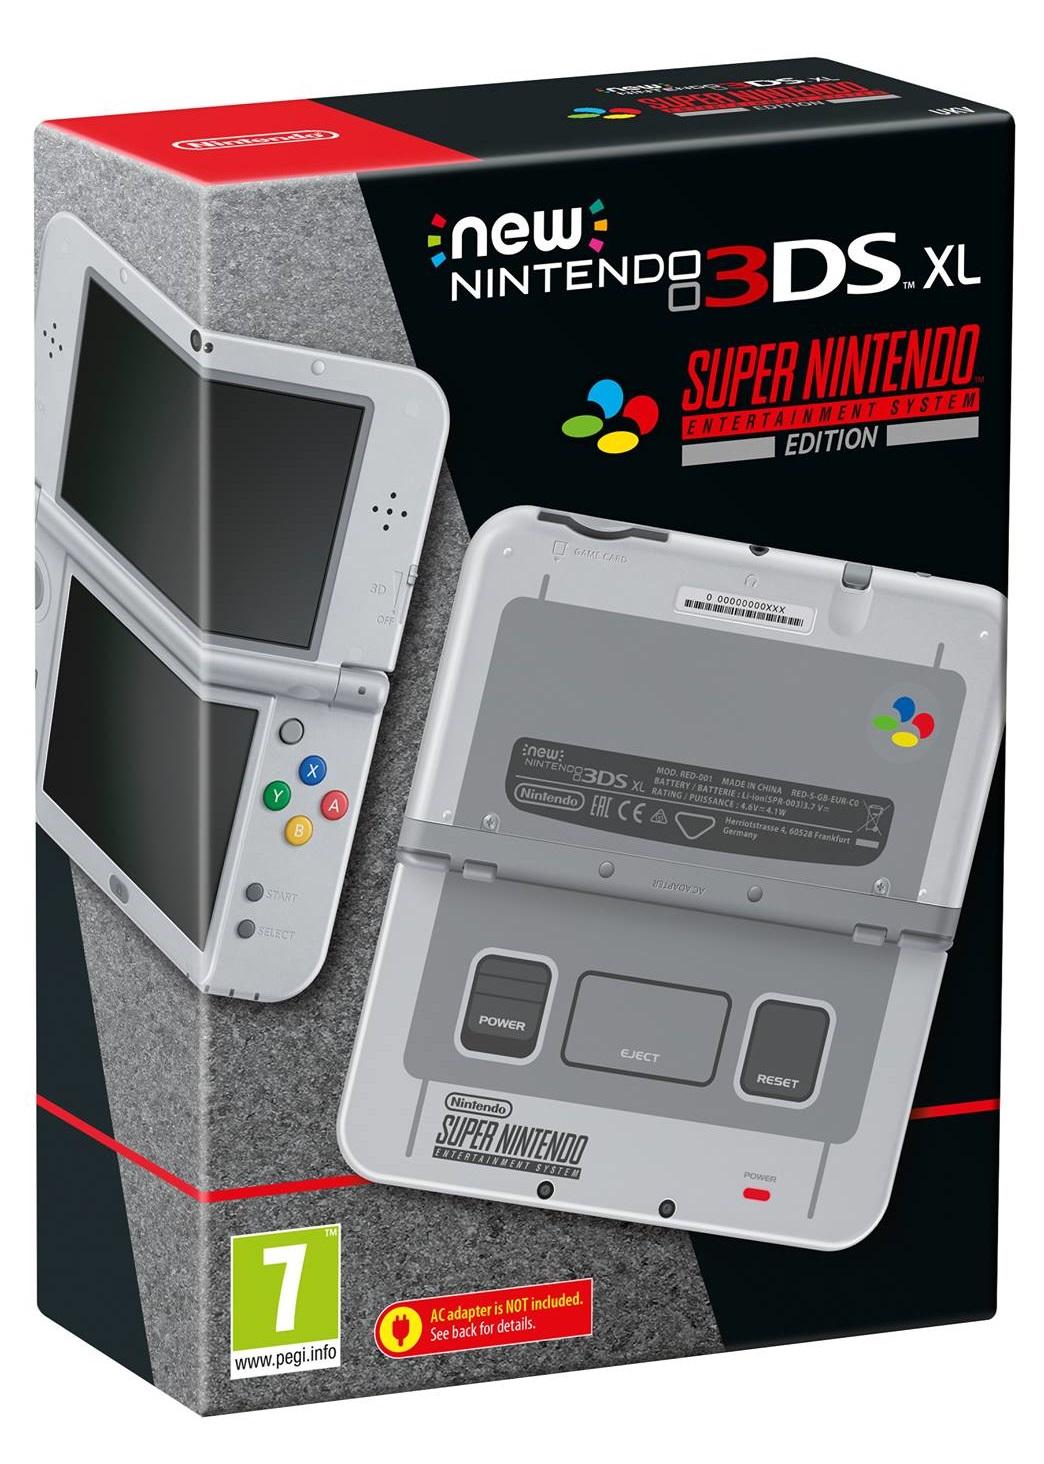 New Nintendo 3DS XL SNES (Super Nintendo) Edition